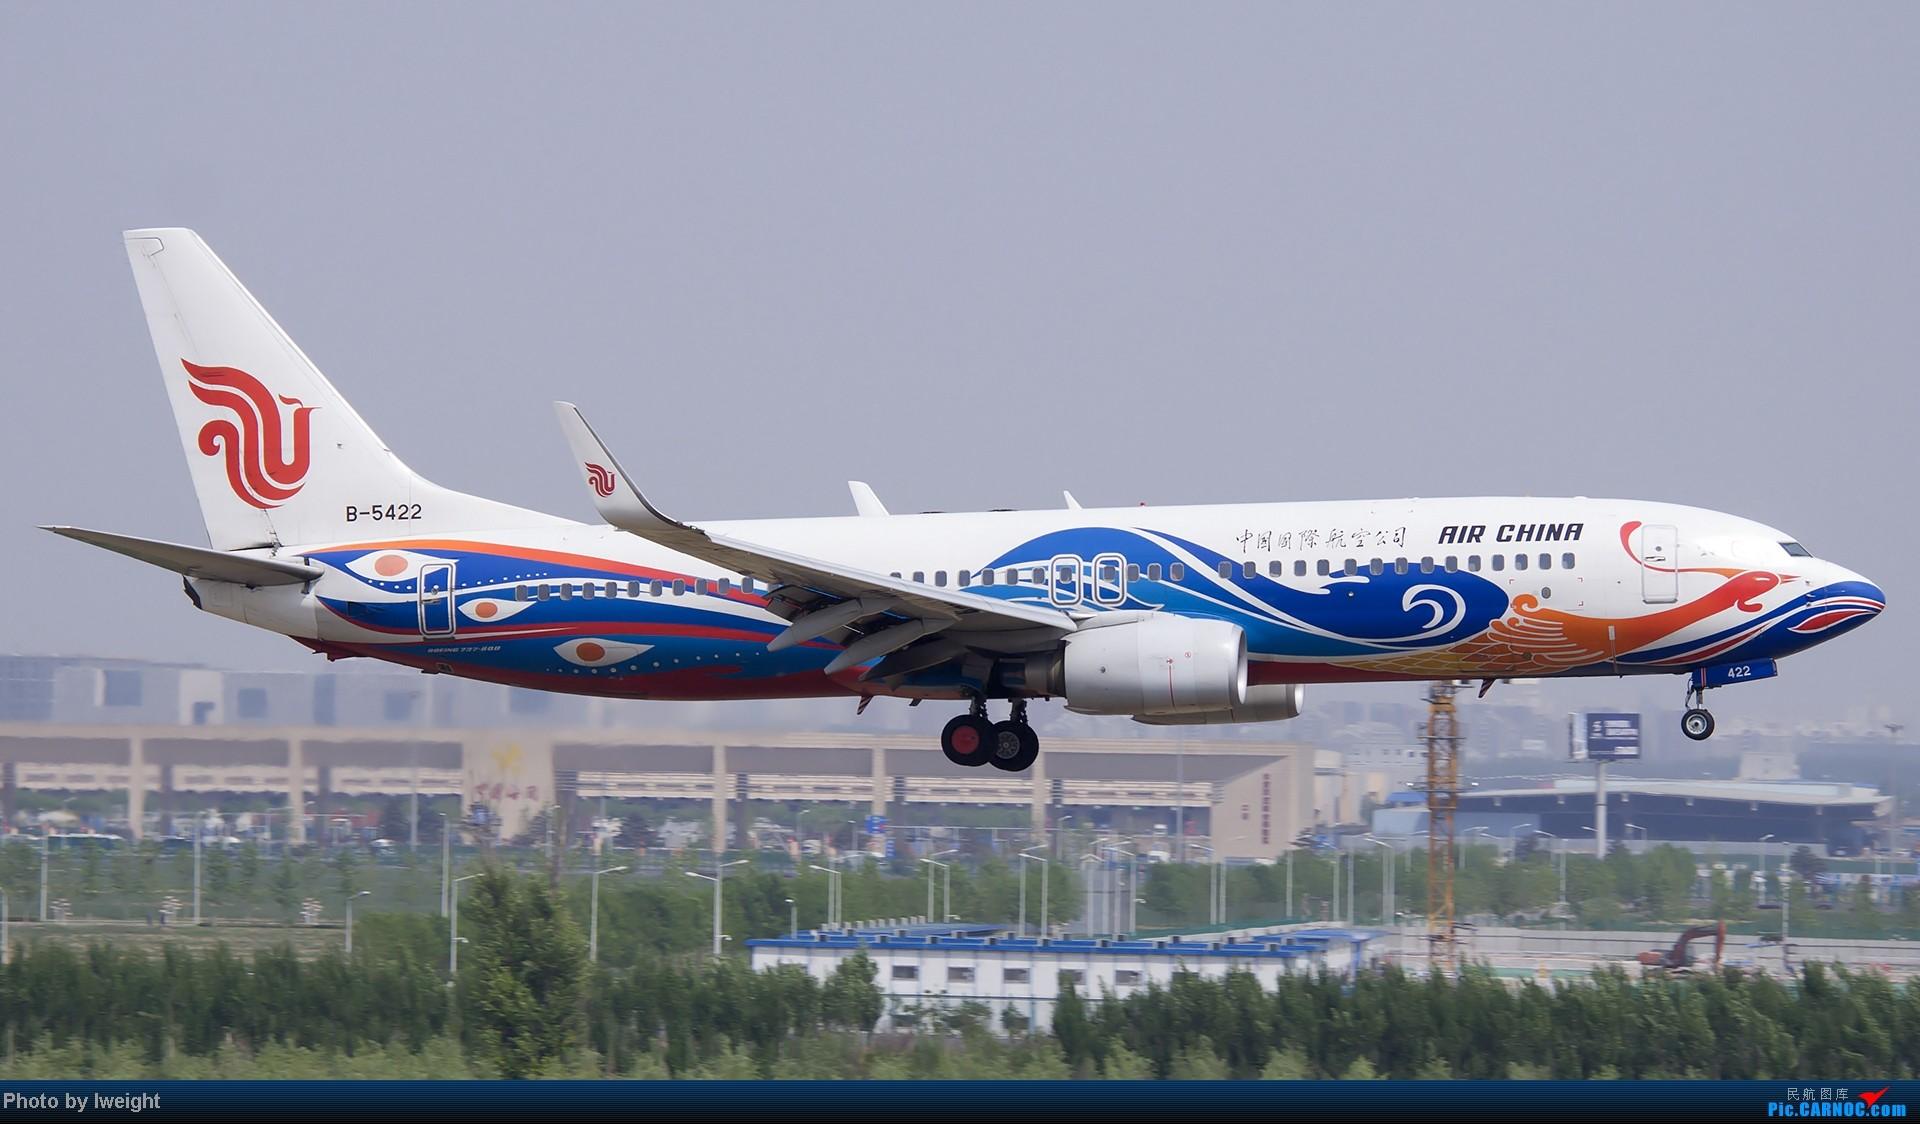 Re:[原创]错过了卡航的巴塞罗那号,只有这些大路货了,泪奔啊 BOEING 737-800 B-5422 中国北京首都机场